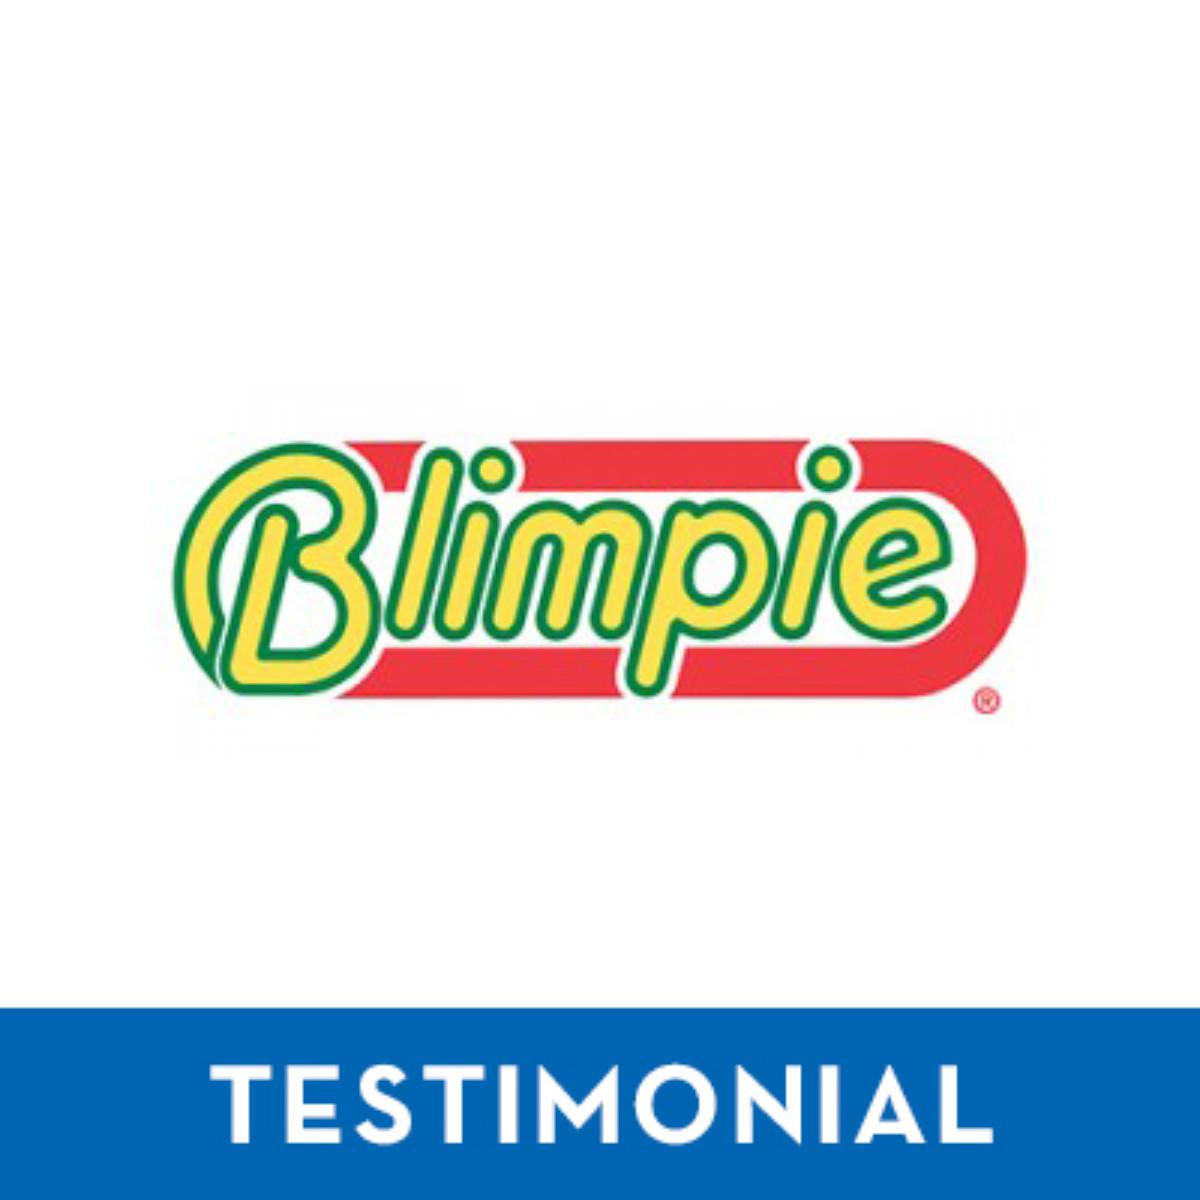 blimpie-testimonial-thumbnail-1200x1200